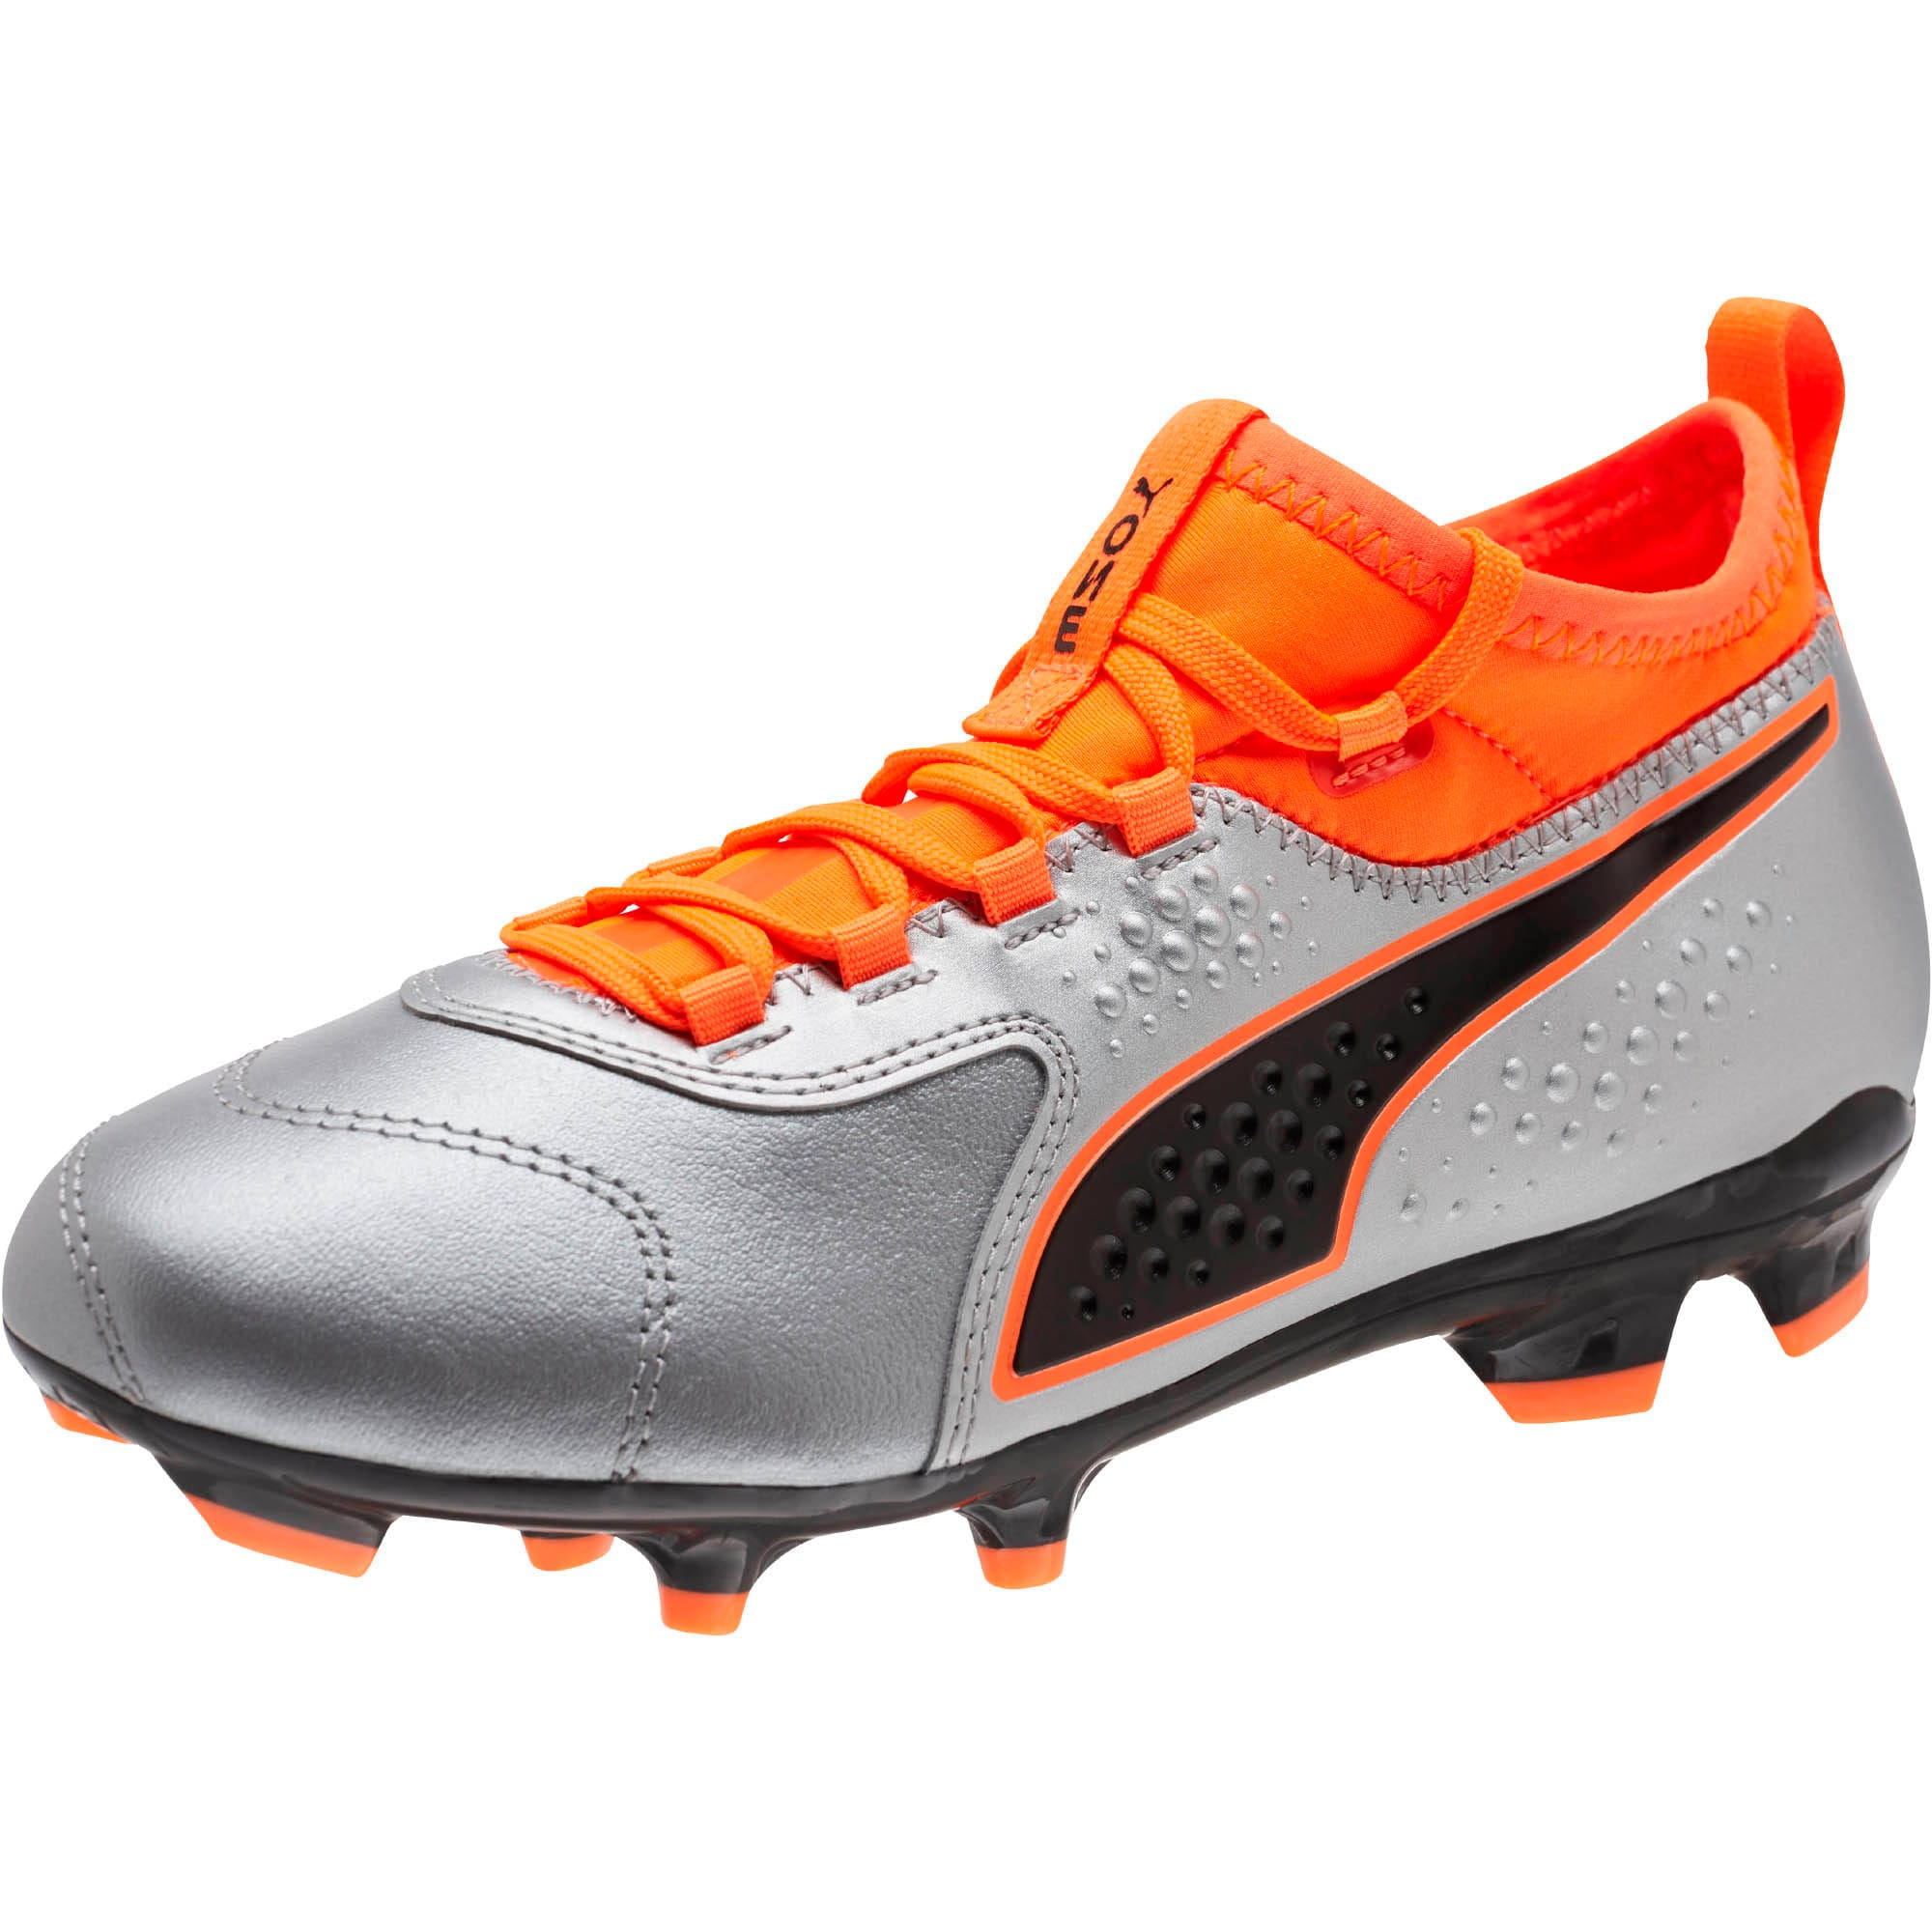 Thumbnail 1 of PUMA ONE 3 FG Soccer Cleats JR, Silver-Orange-Black, medium